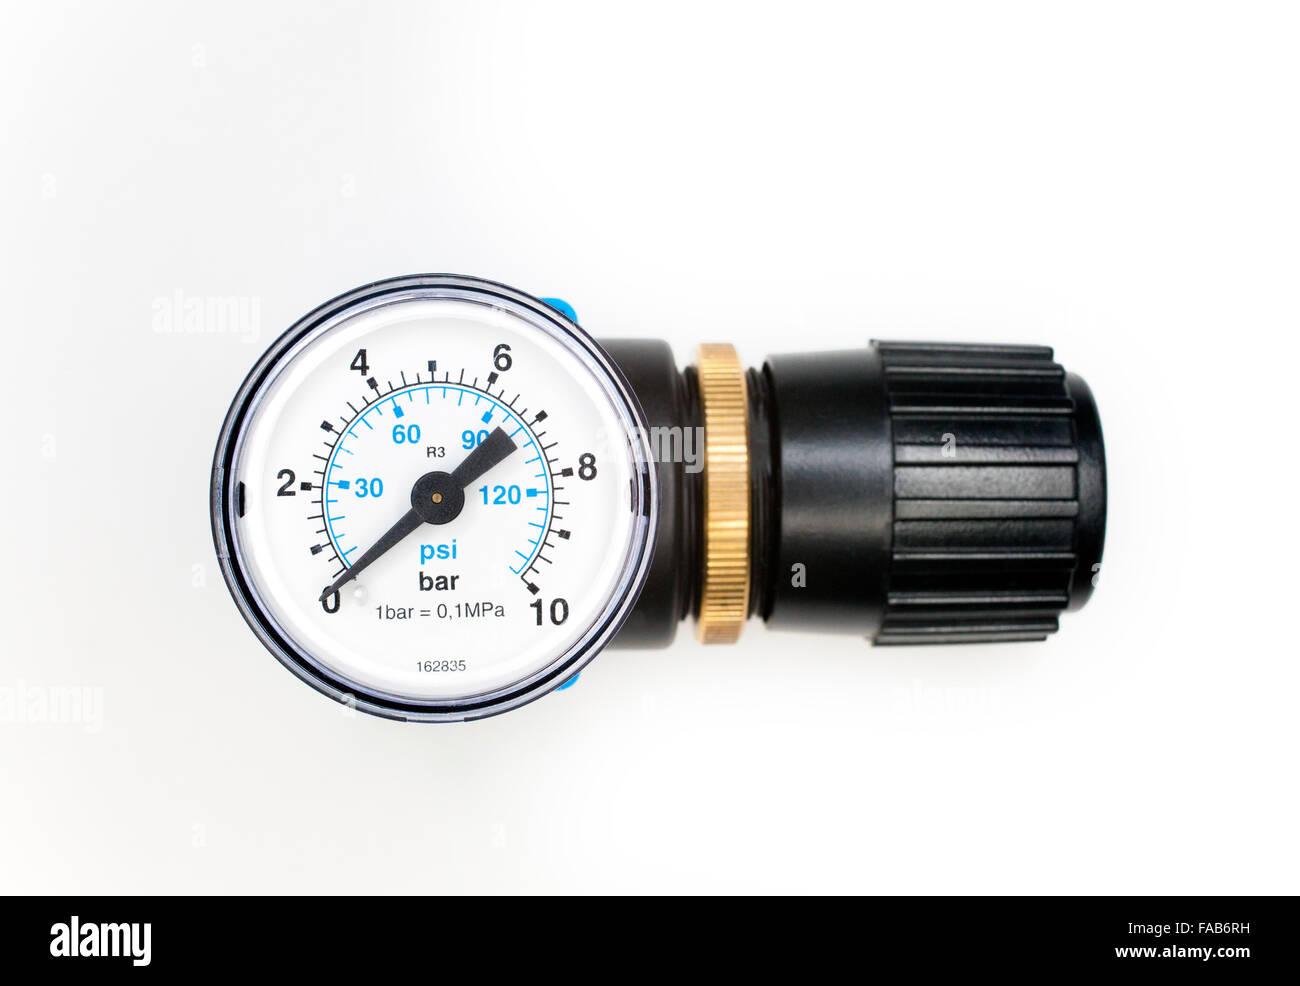 pressure regulator and gauge - Stock Image